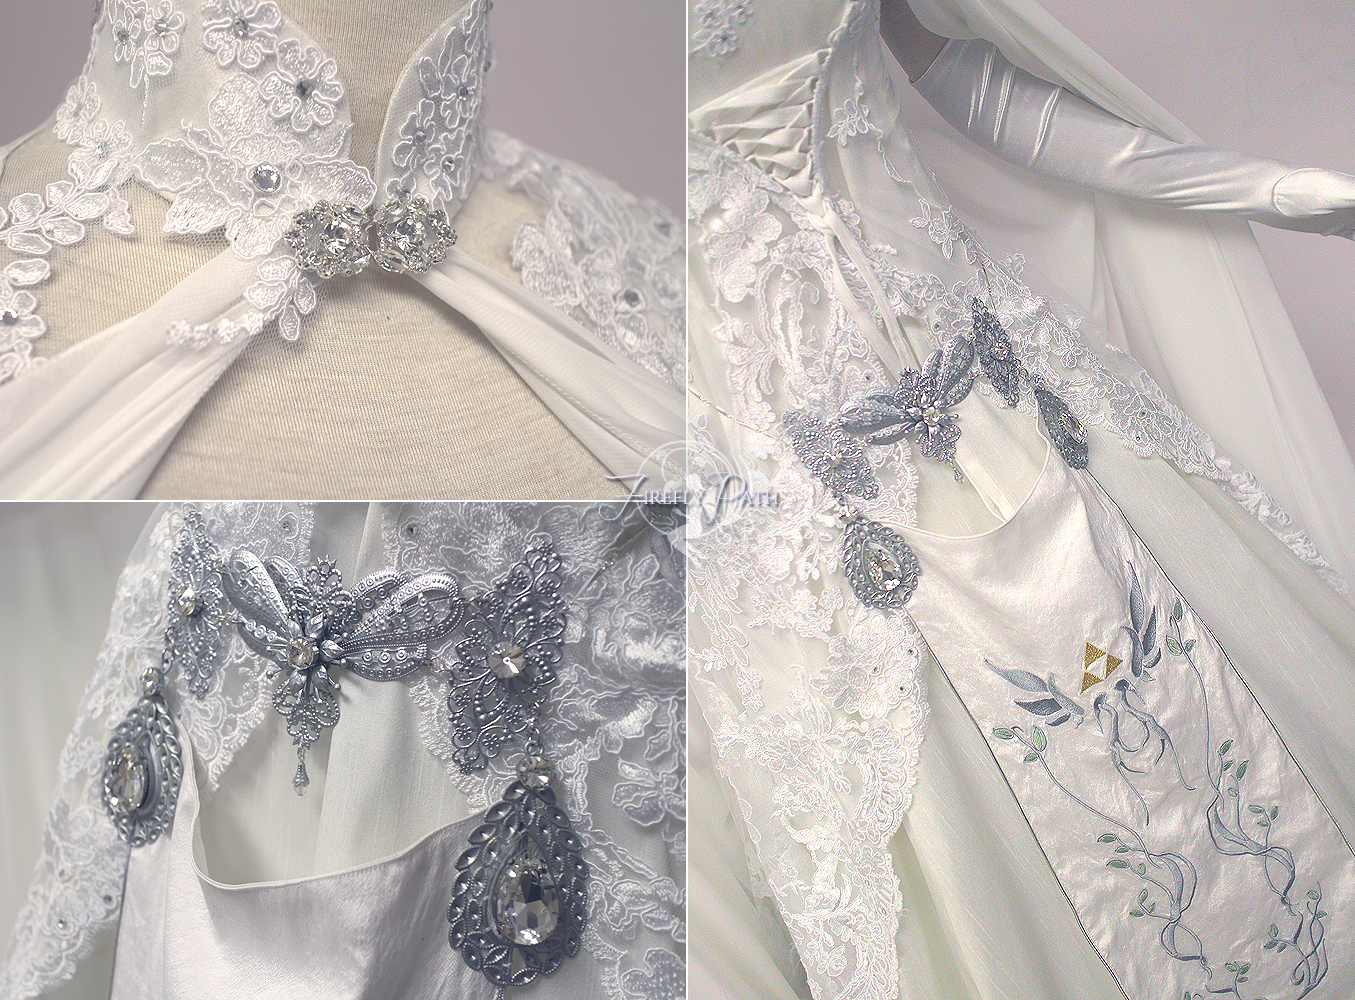 Zelda Wedding Dress Details